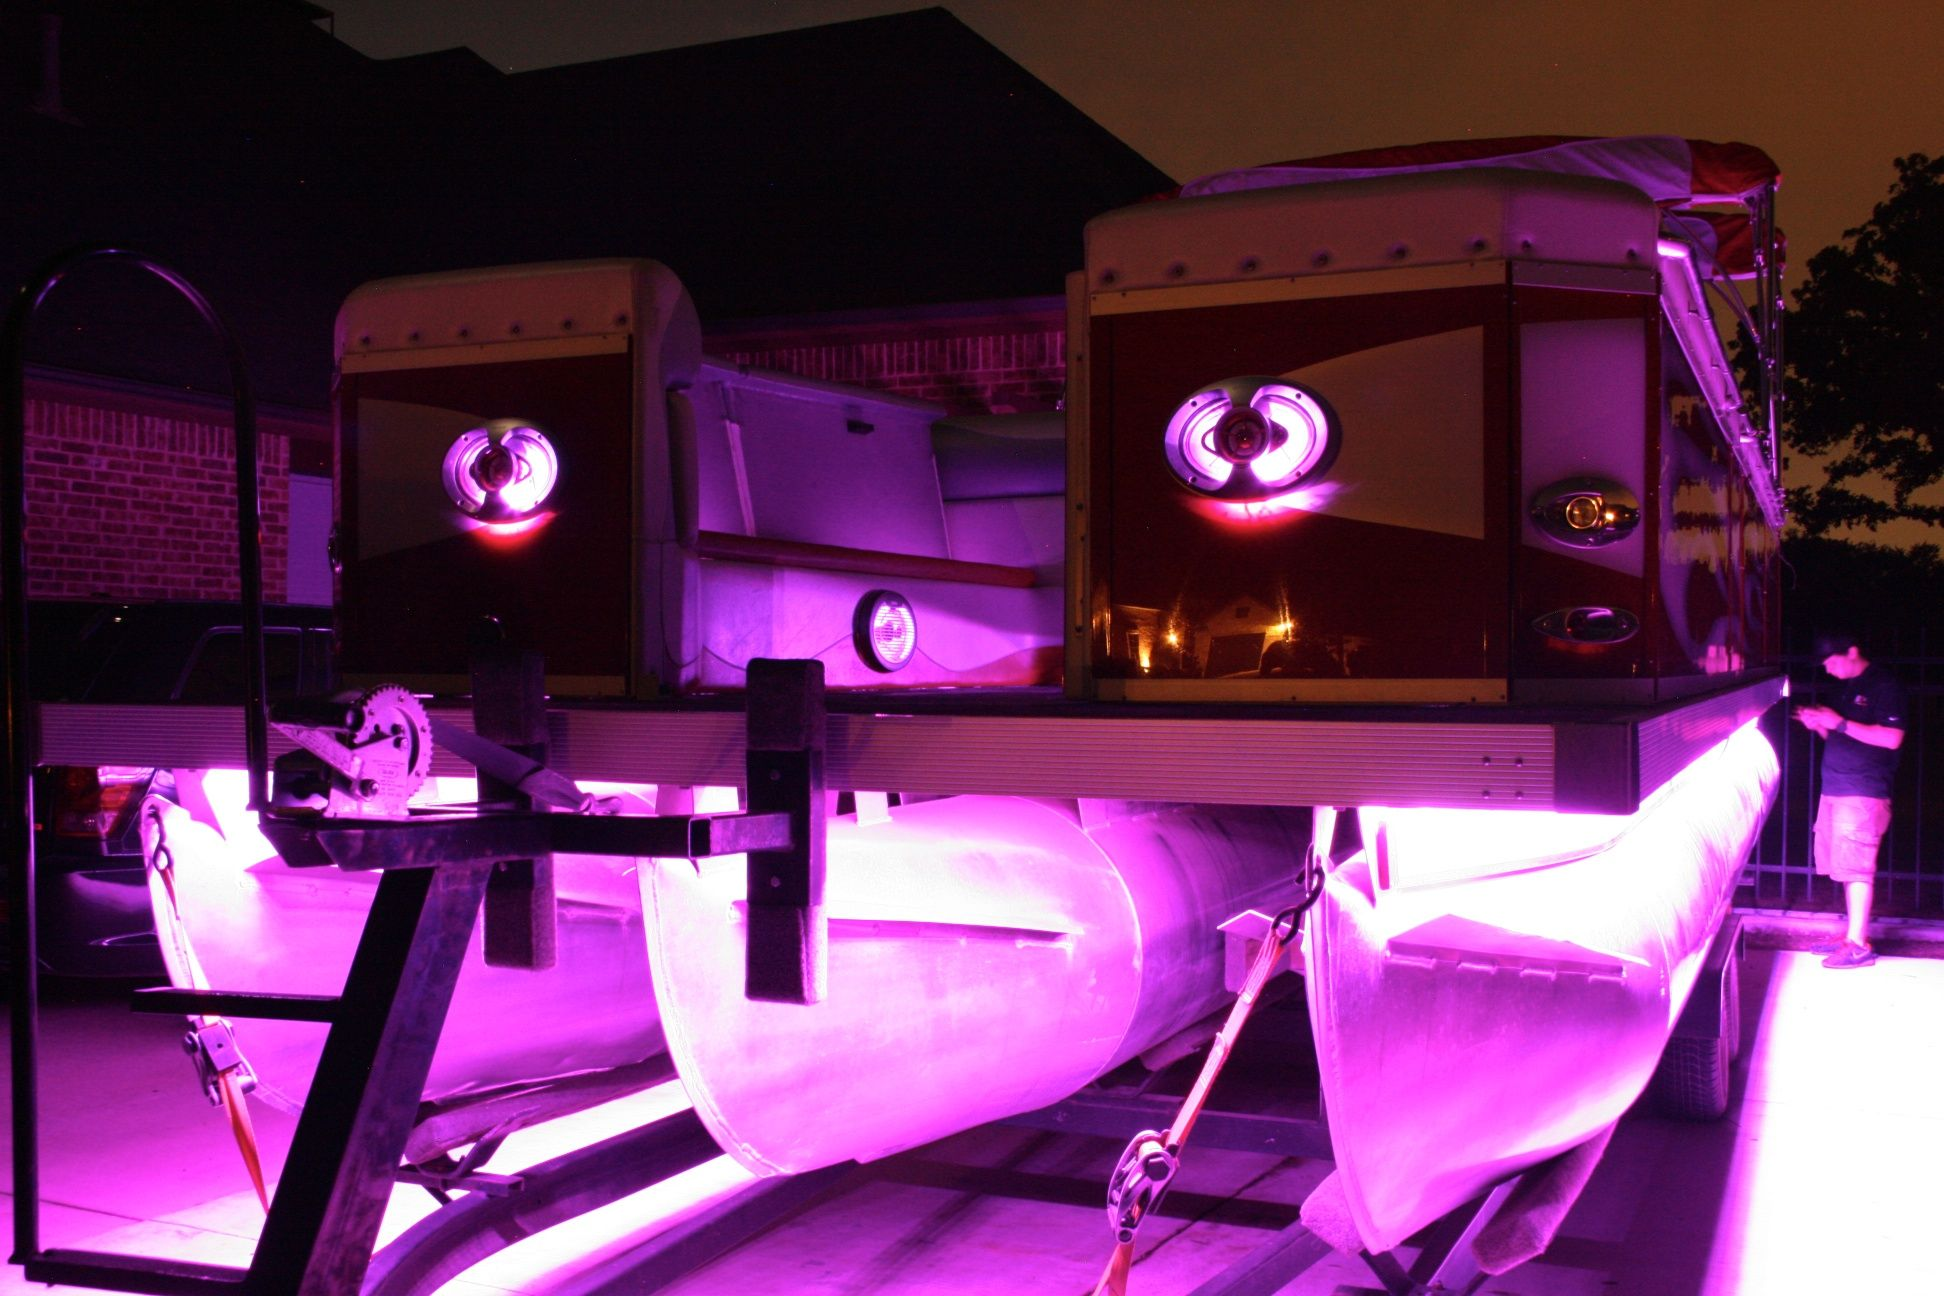 LED lights 13 Speaker sound system 27ft  pontoon boat   6  Speakers located  insinde   6  six speakers located on exterior of boat  that way you can  still  LED lights 13 Speaker sound system 27ft  pontoon boat   6  . Exterior Led Lights For Boats. Home Design Ideas